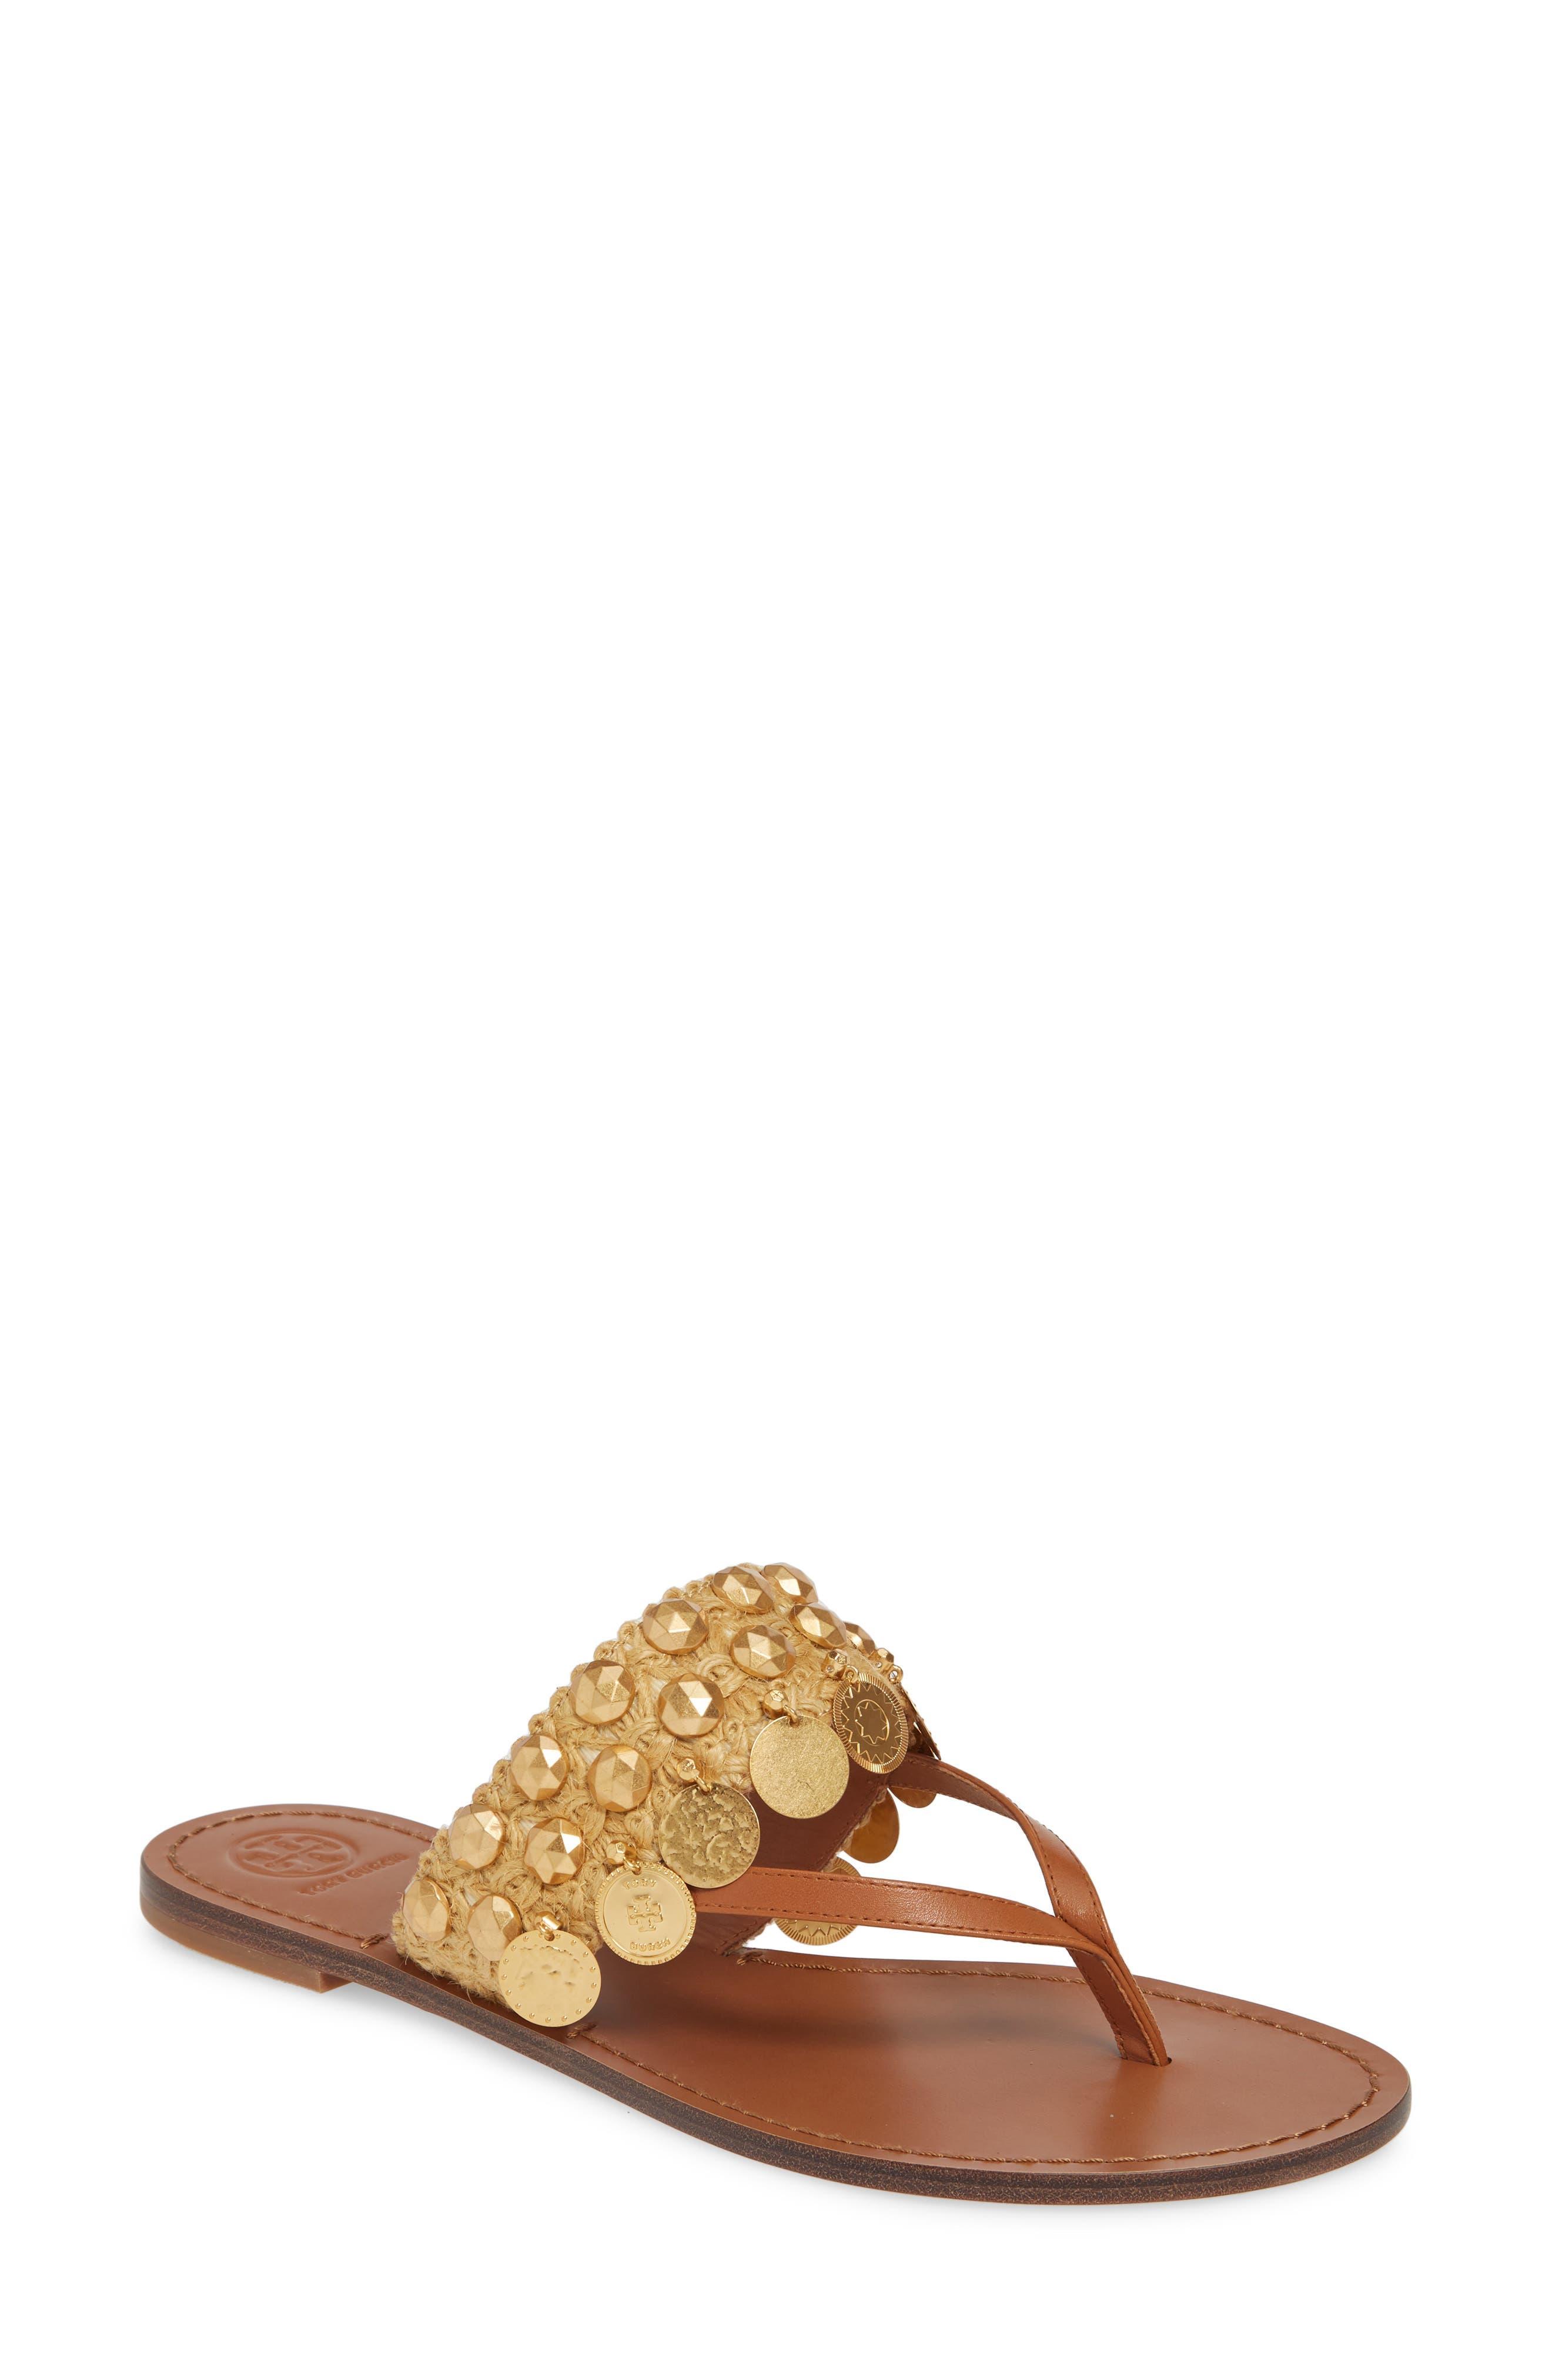 Tory Burch Patos Coin Thong Sandal, Brown